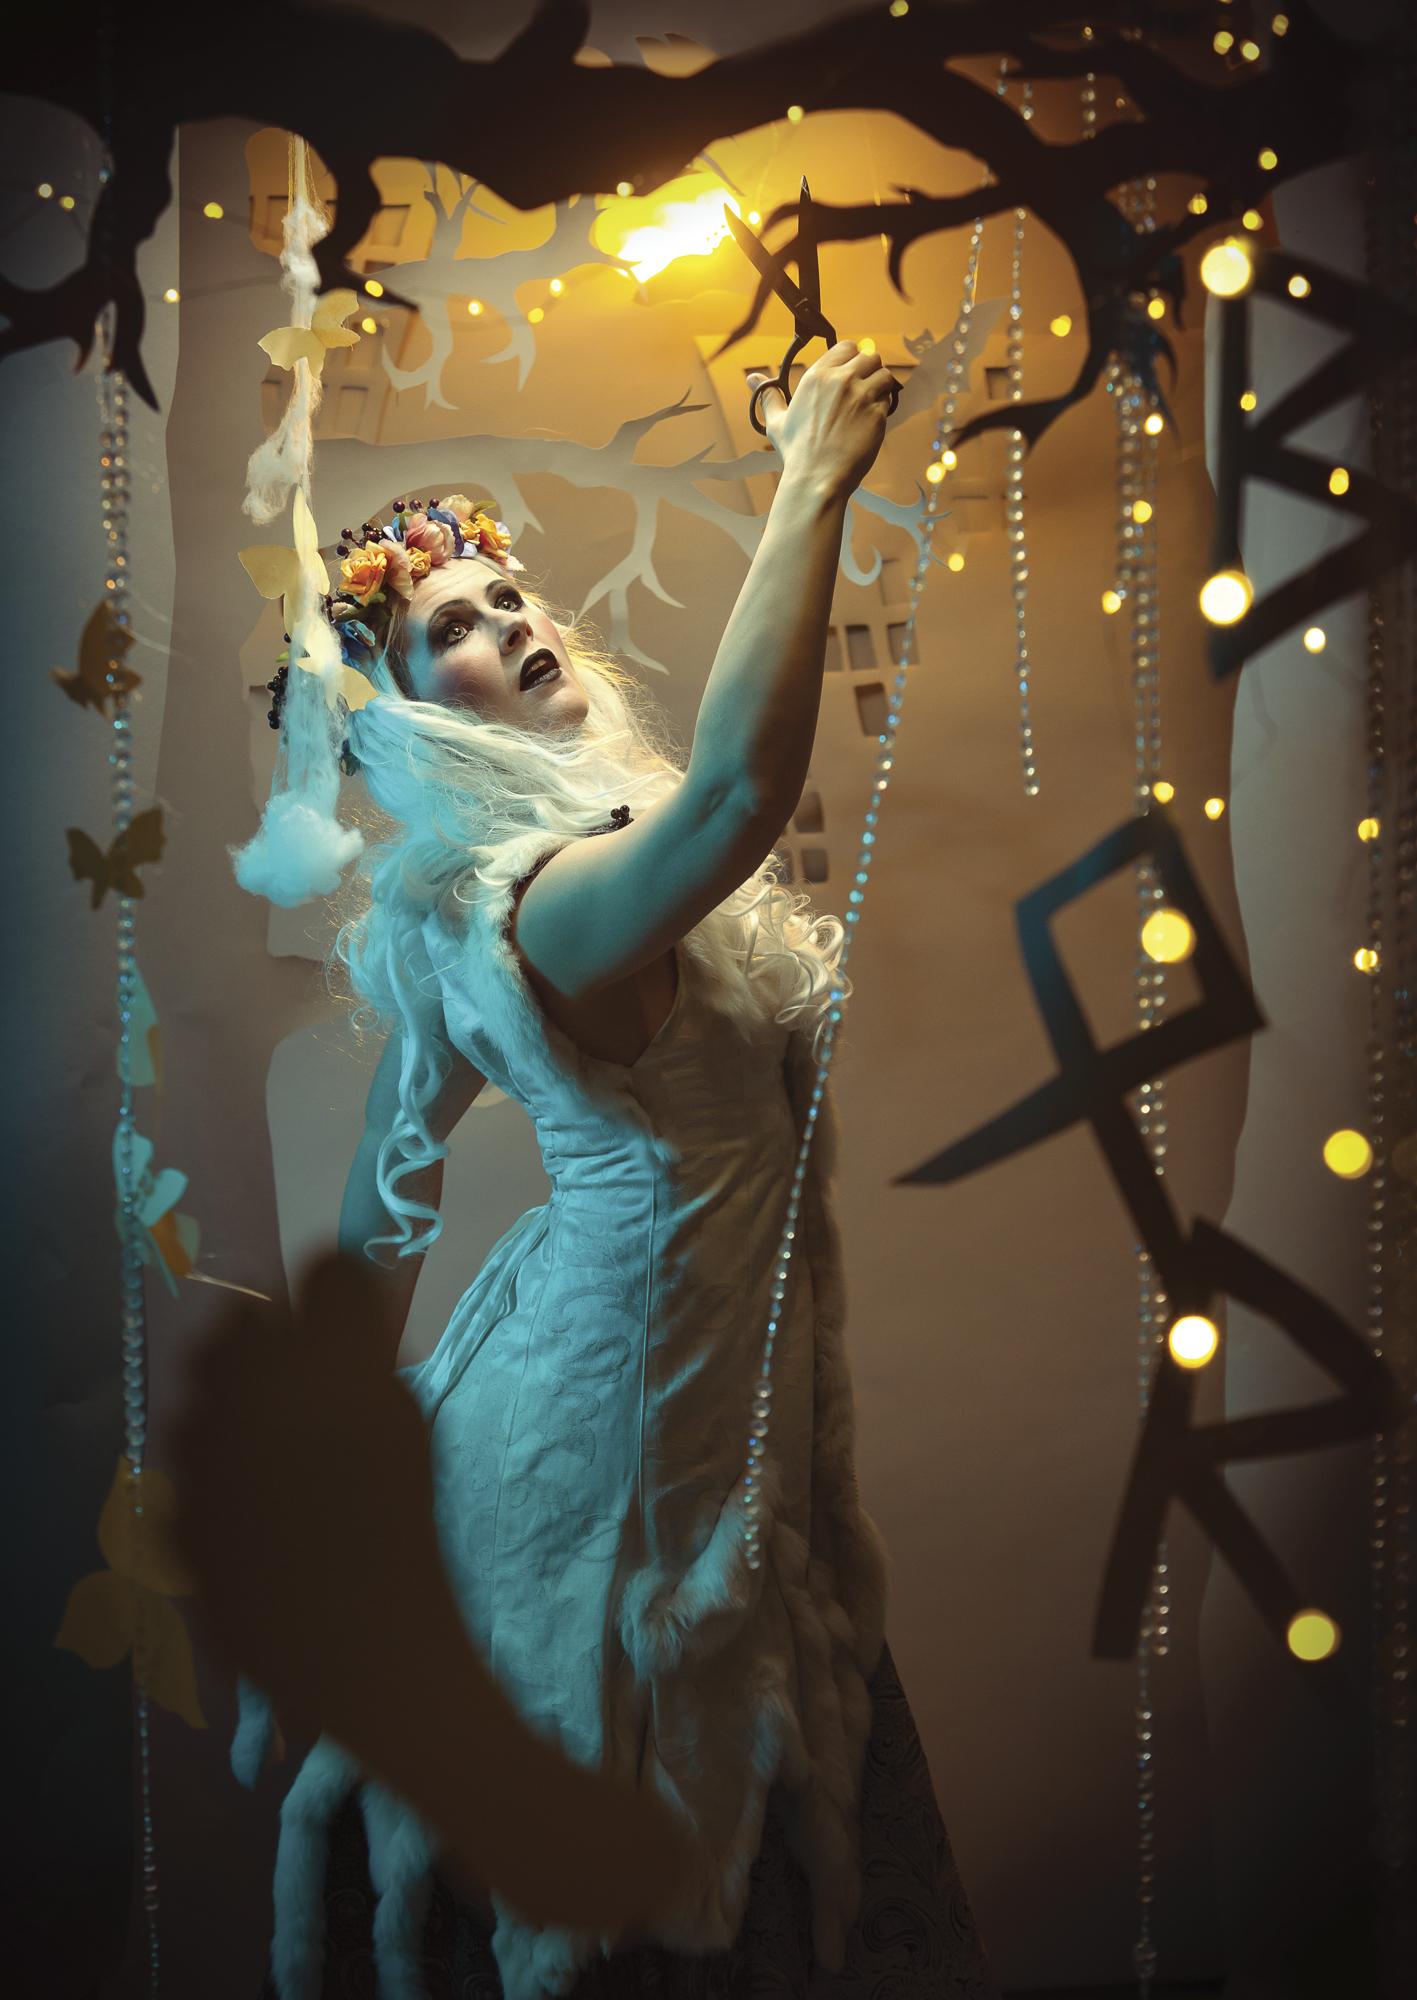 Kalendershooting | Titelbild | Scherenschnitt | Kostüm | Make-Up | Selbstportrait